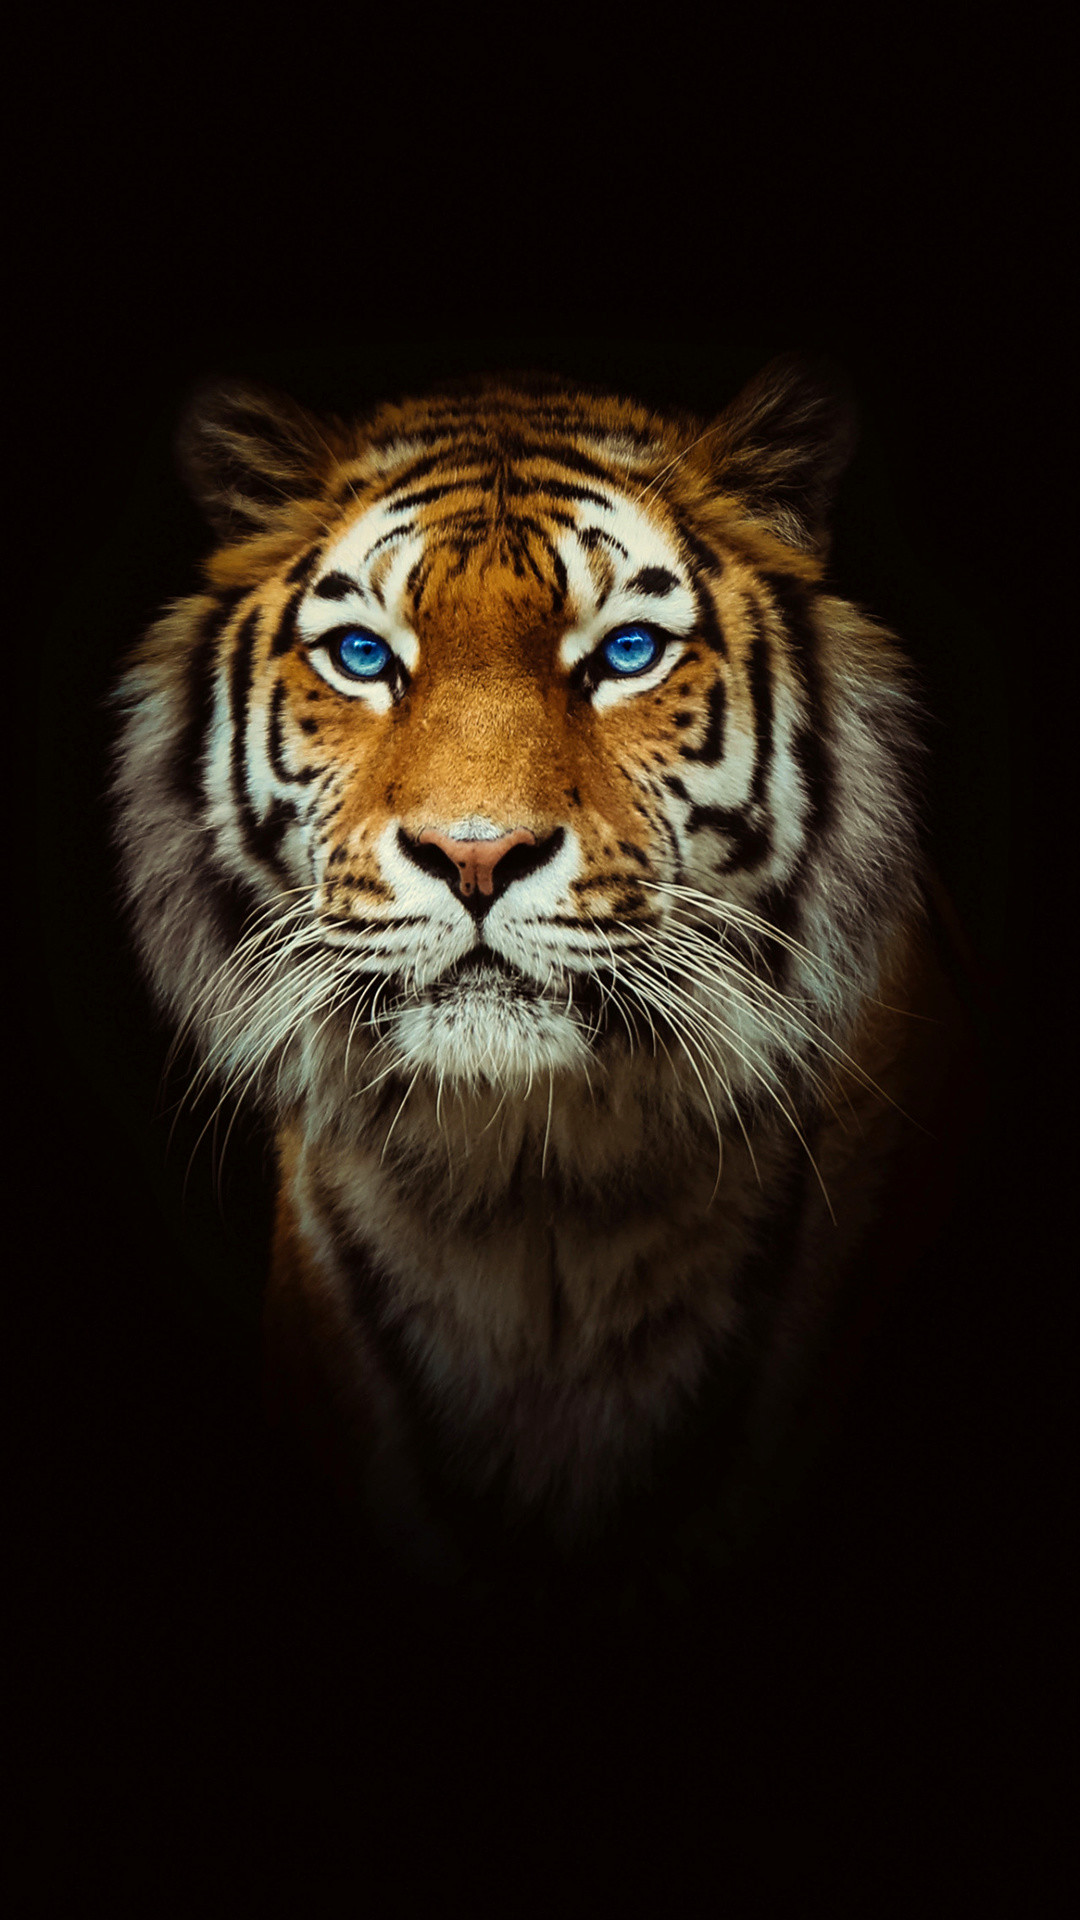 Black Tiger Hd Iphone Wallpaper Labzada